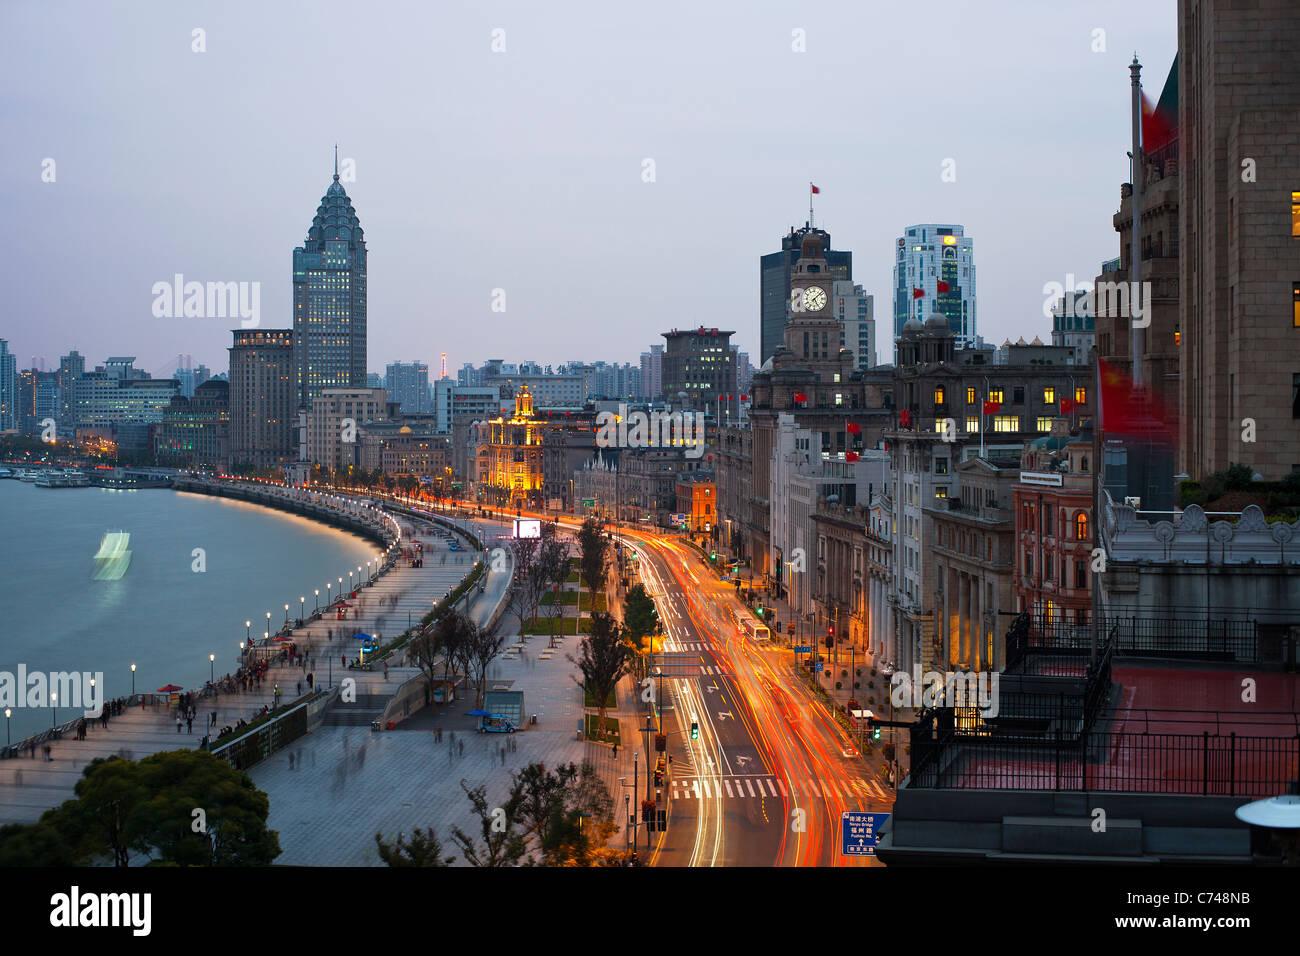 Vista lungo il Bund di notte, Shanghai, Cina Immagini Stock